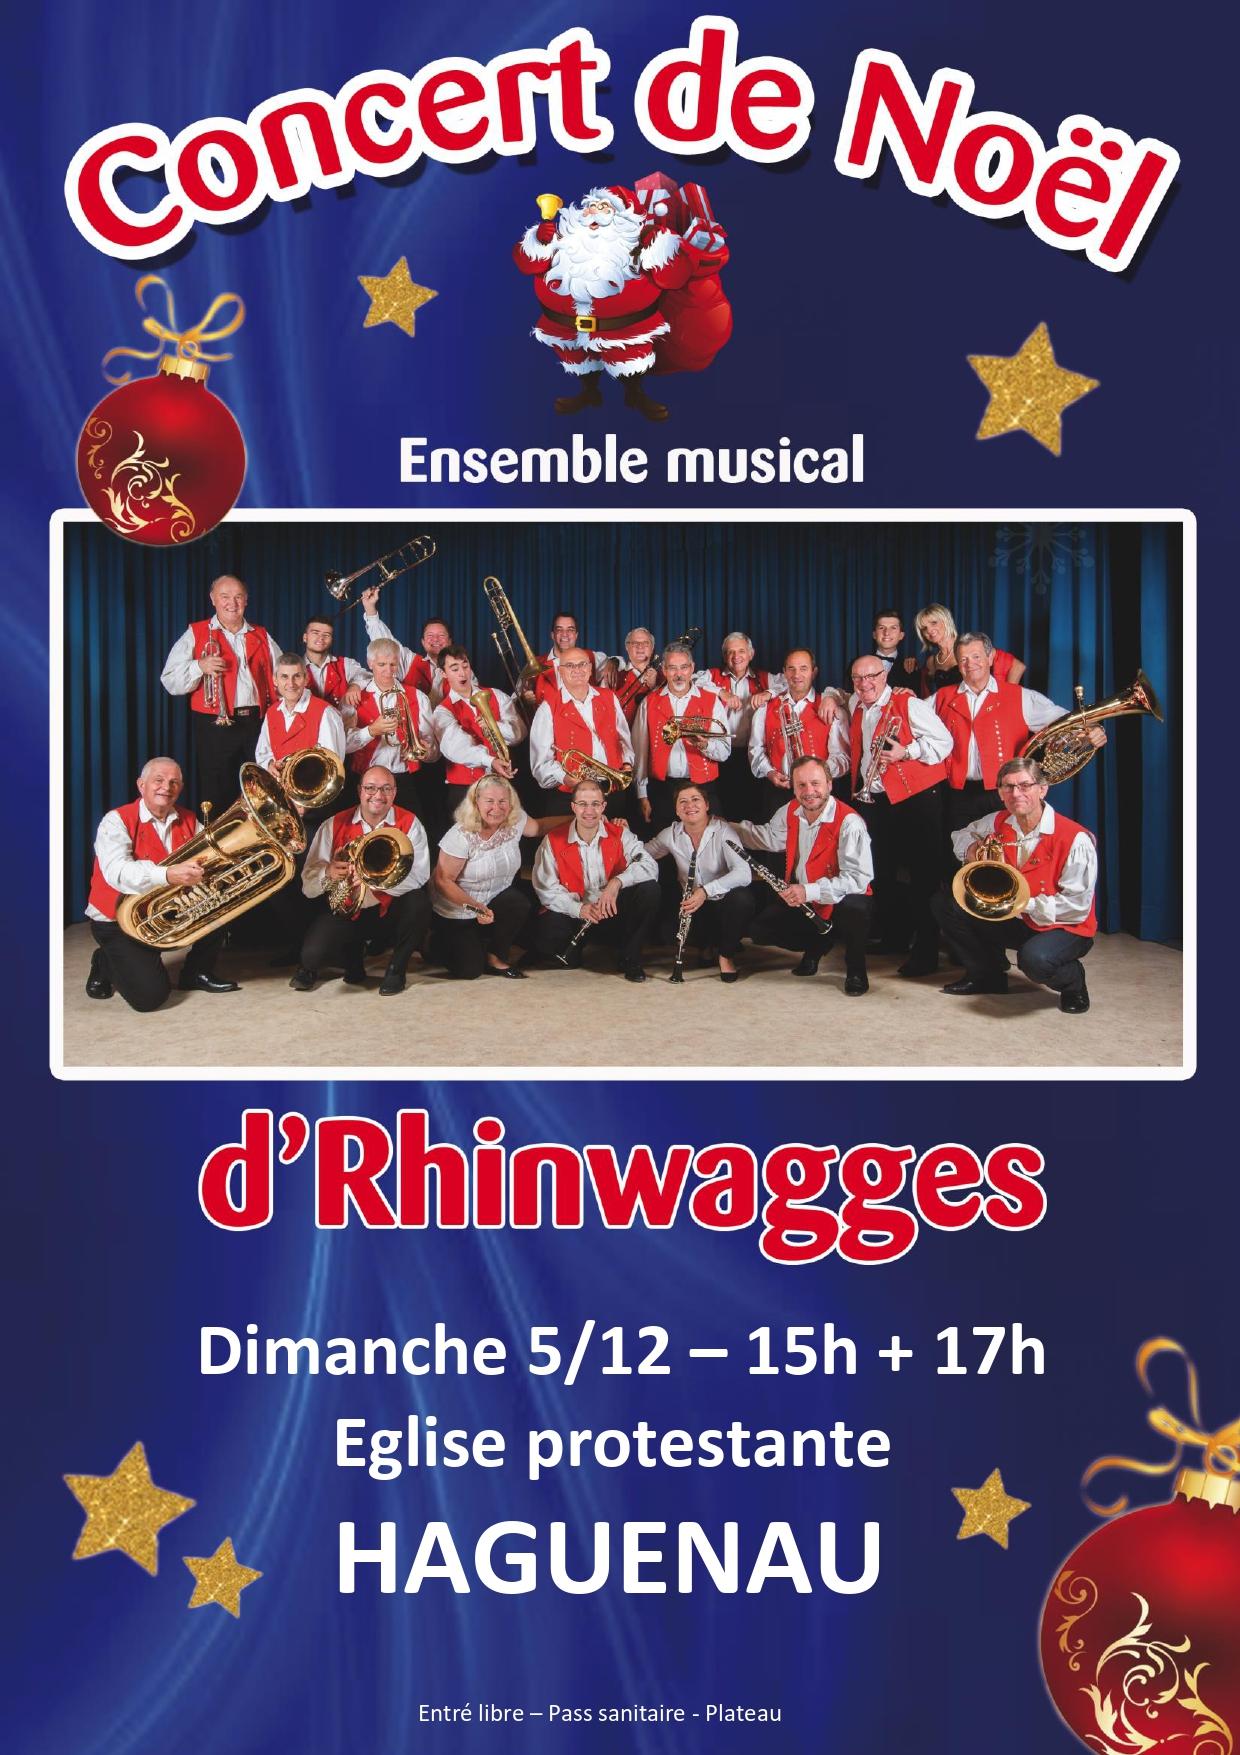 Concert de Noël – ensemble musical d'RHINWAGGES